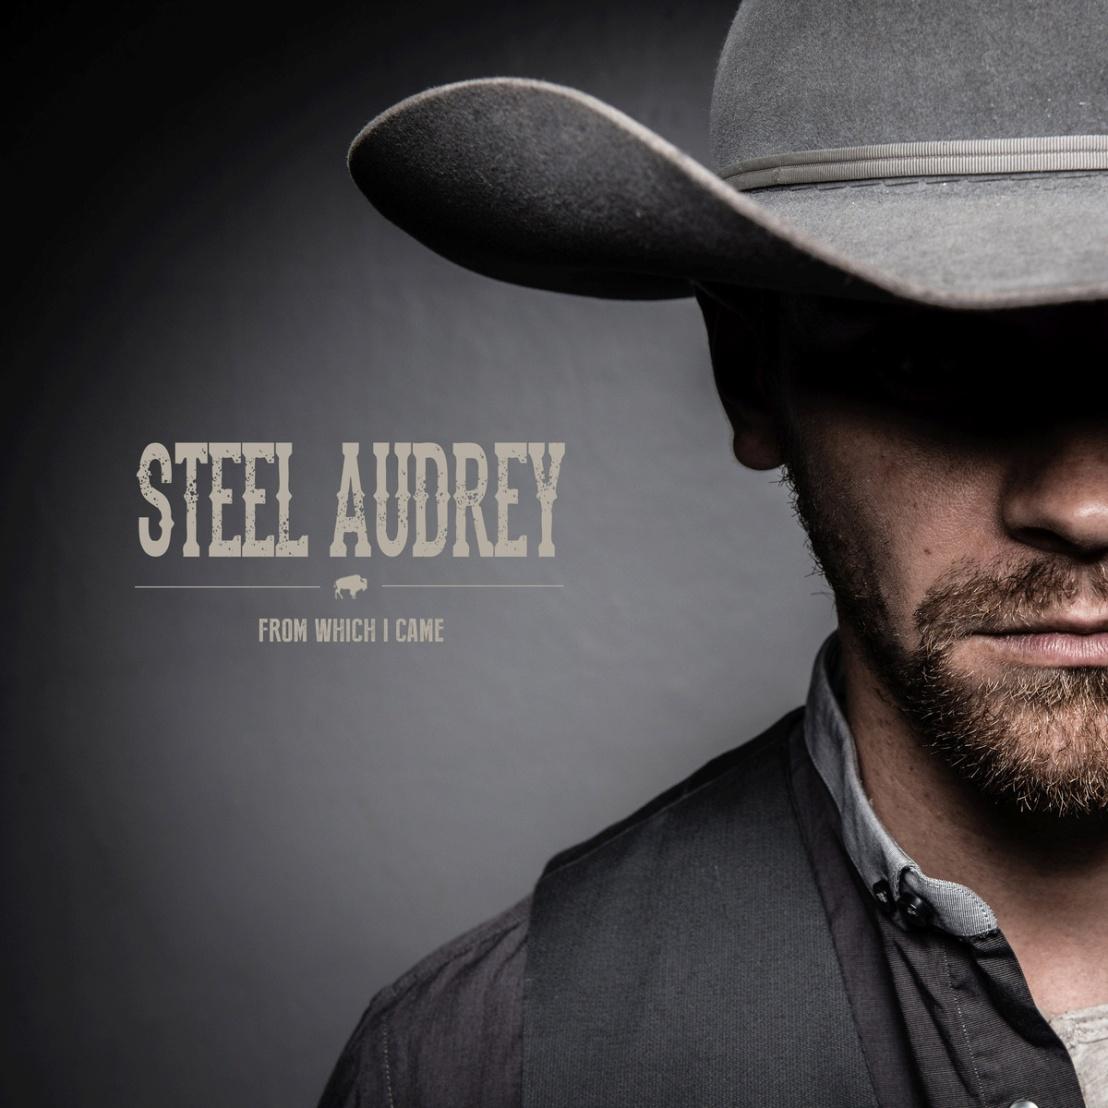 RIP Steel Audrey